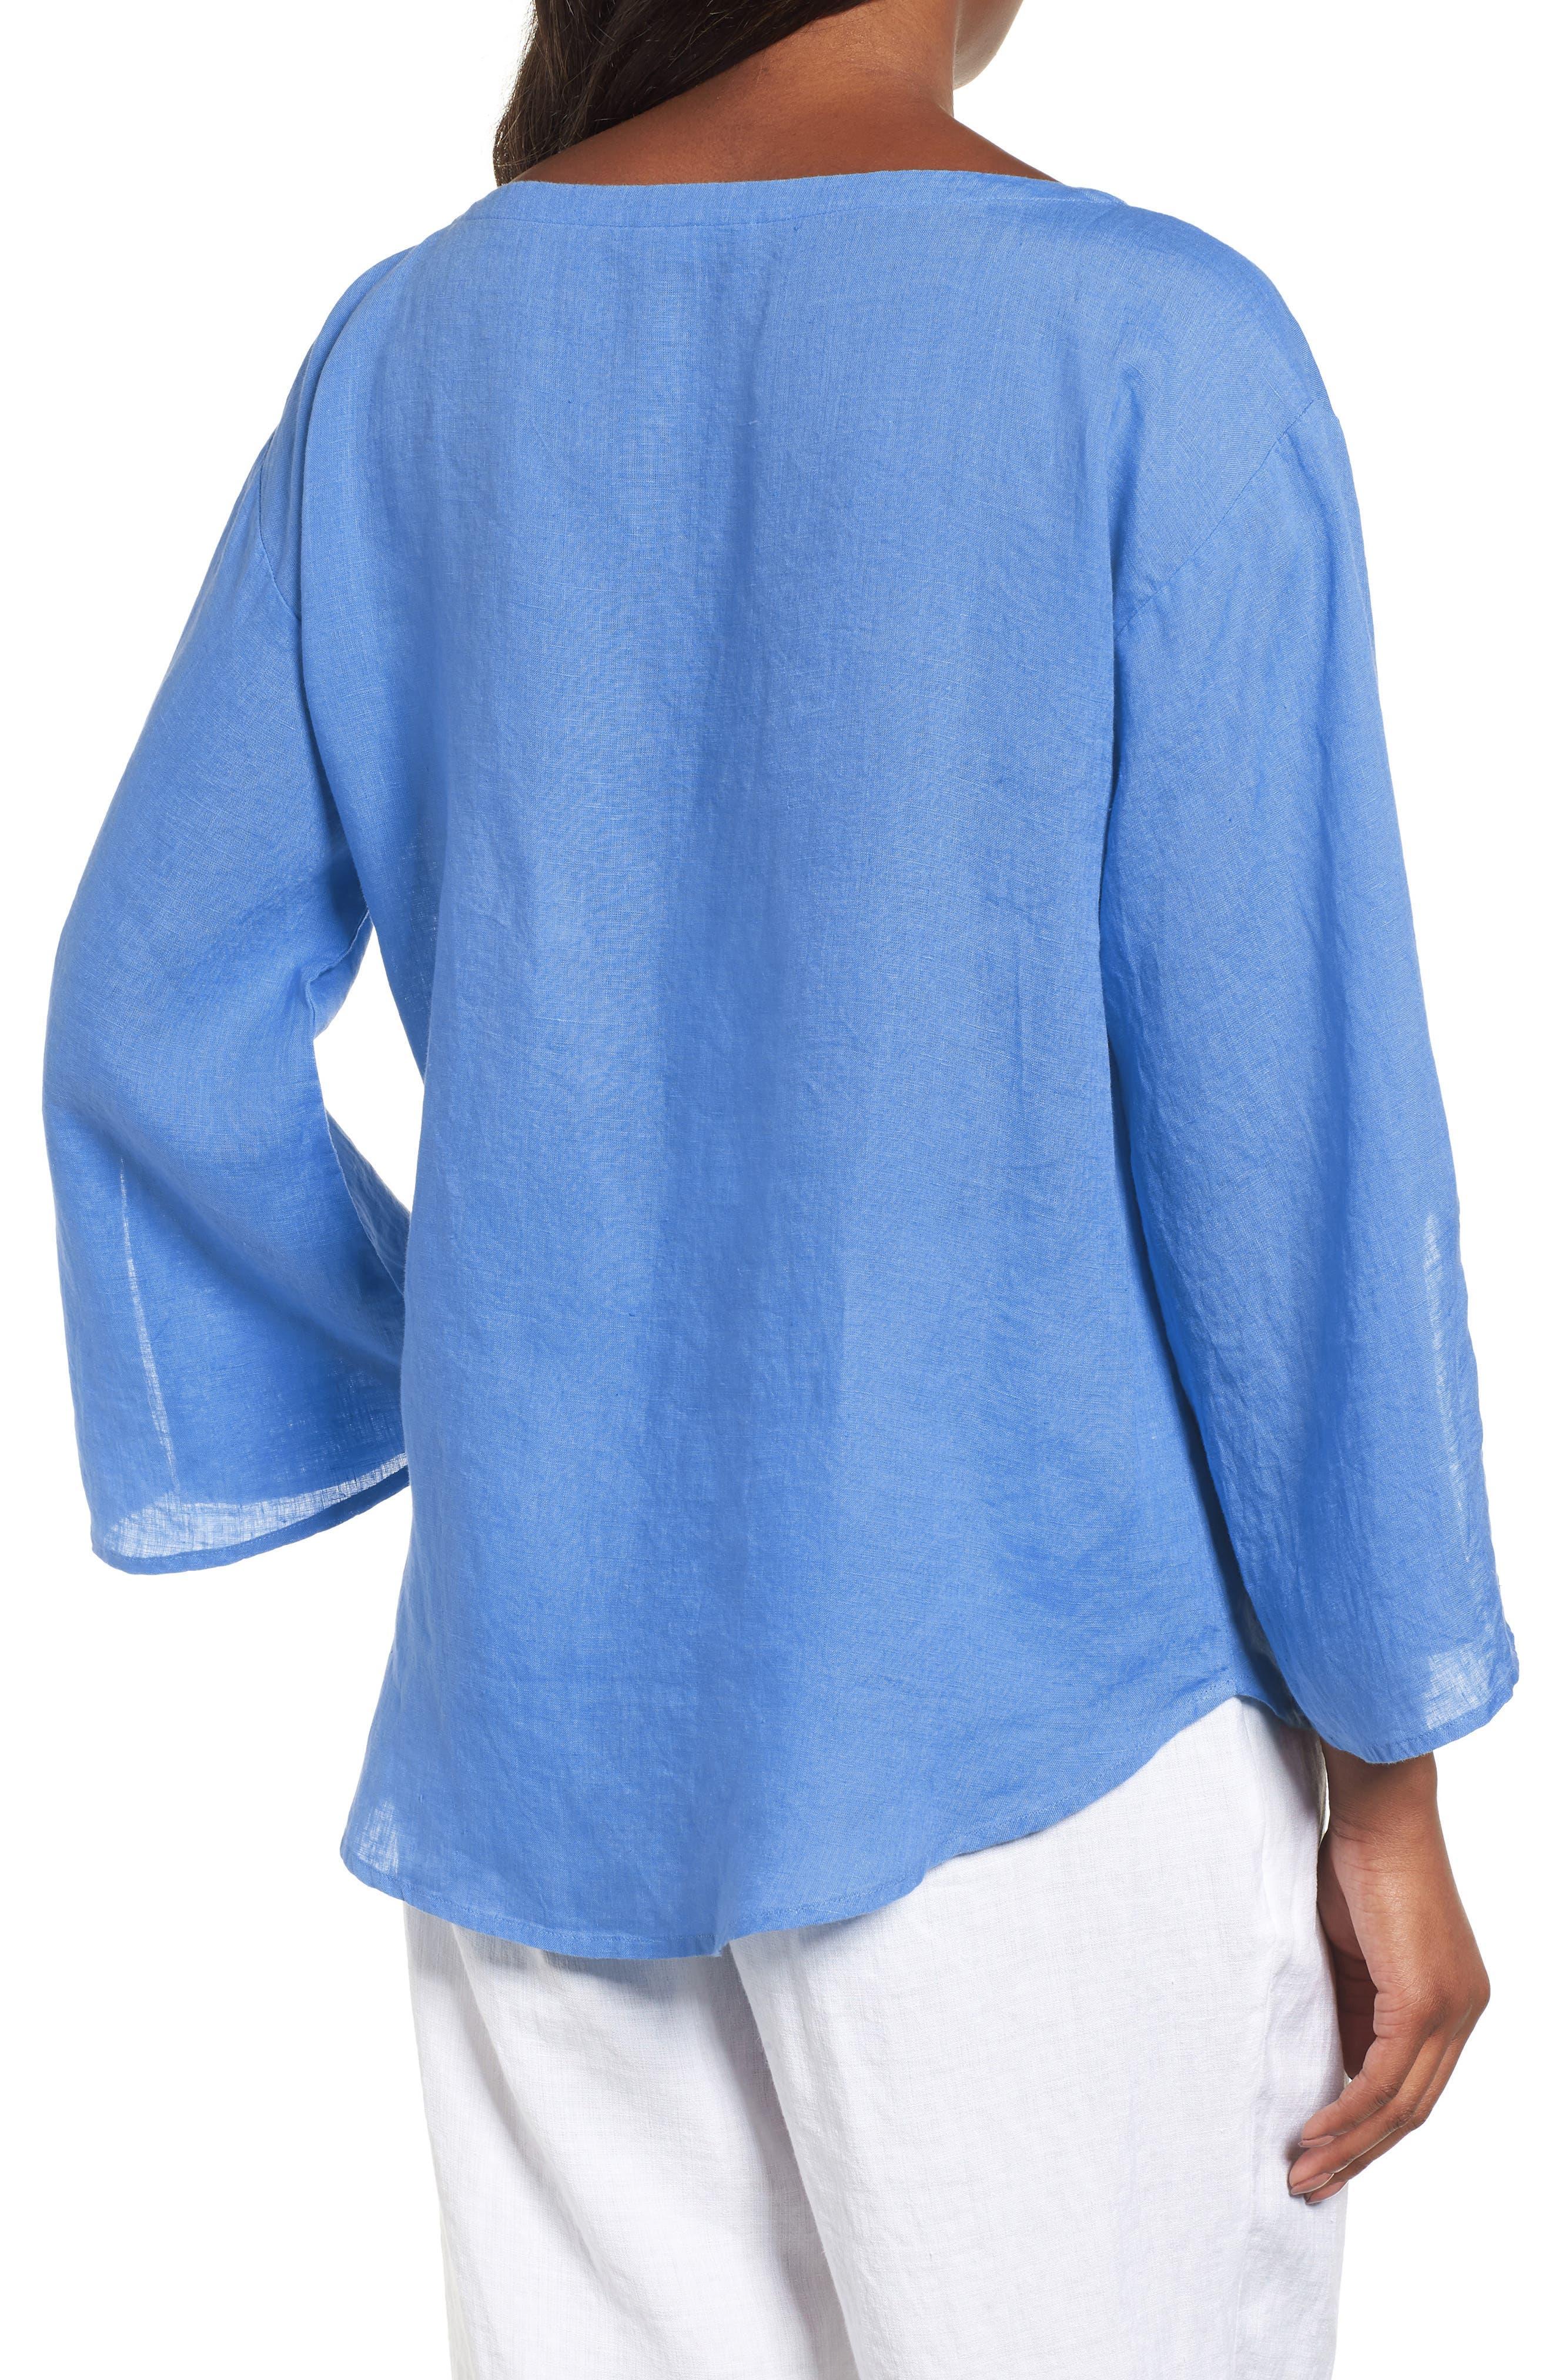 Woven Organic Linen Top,                             Alternate thumbnail 2, color,                             Bluebell